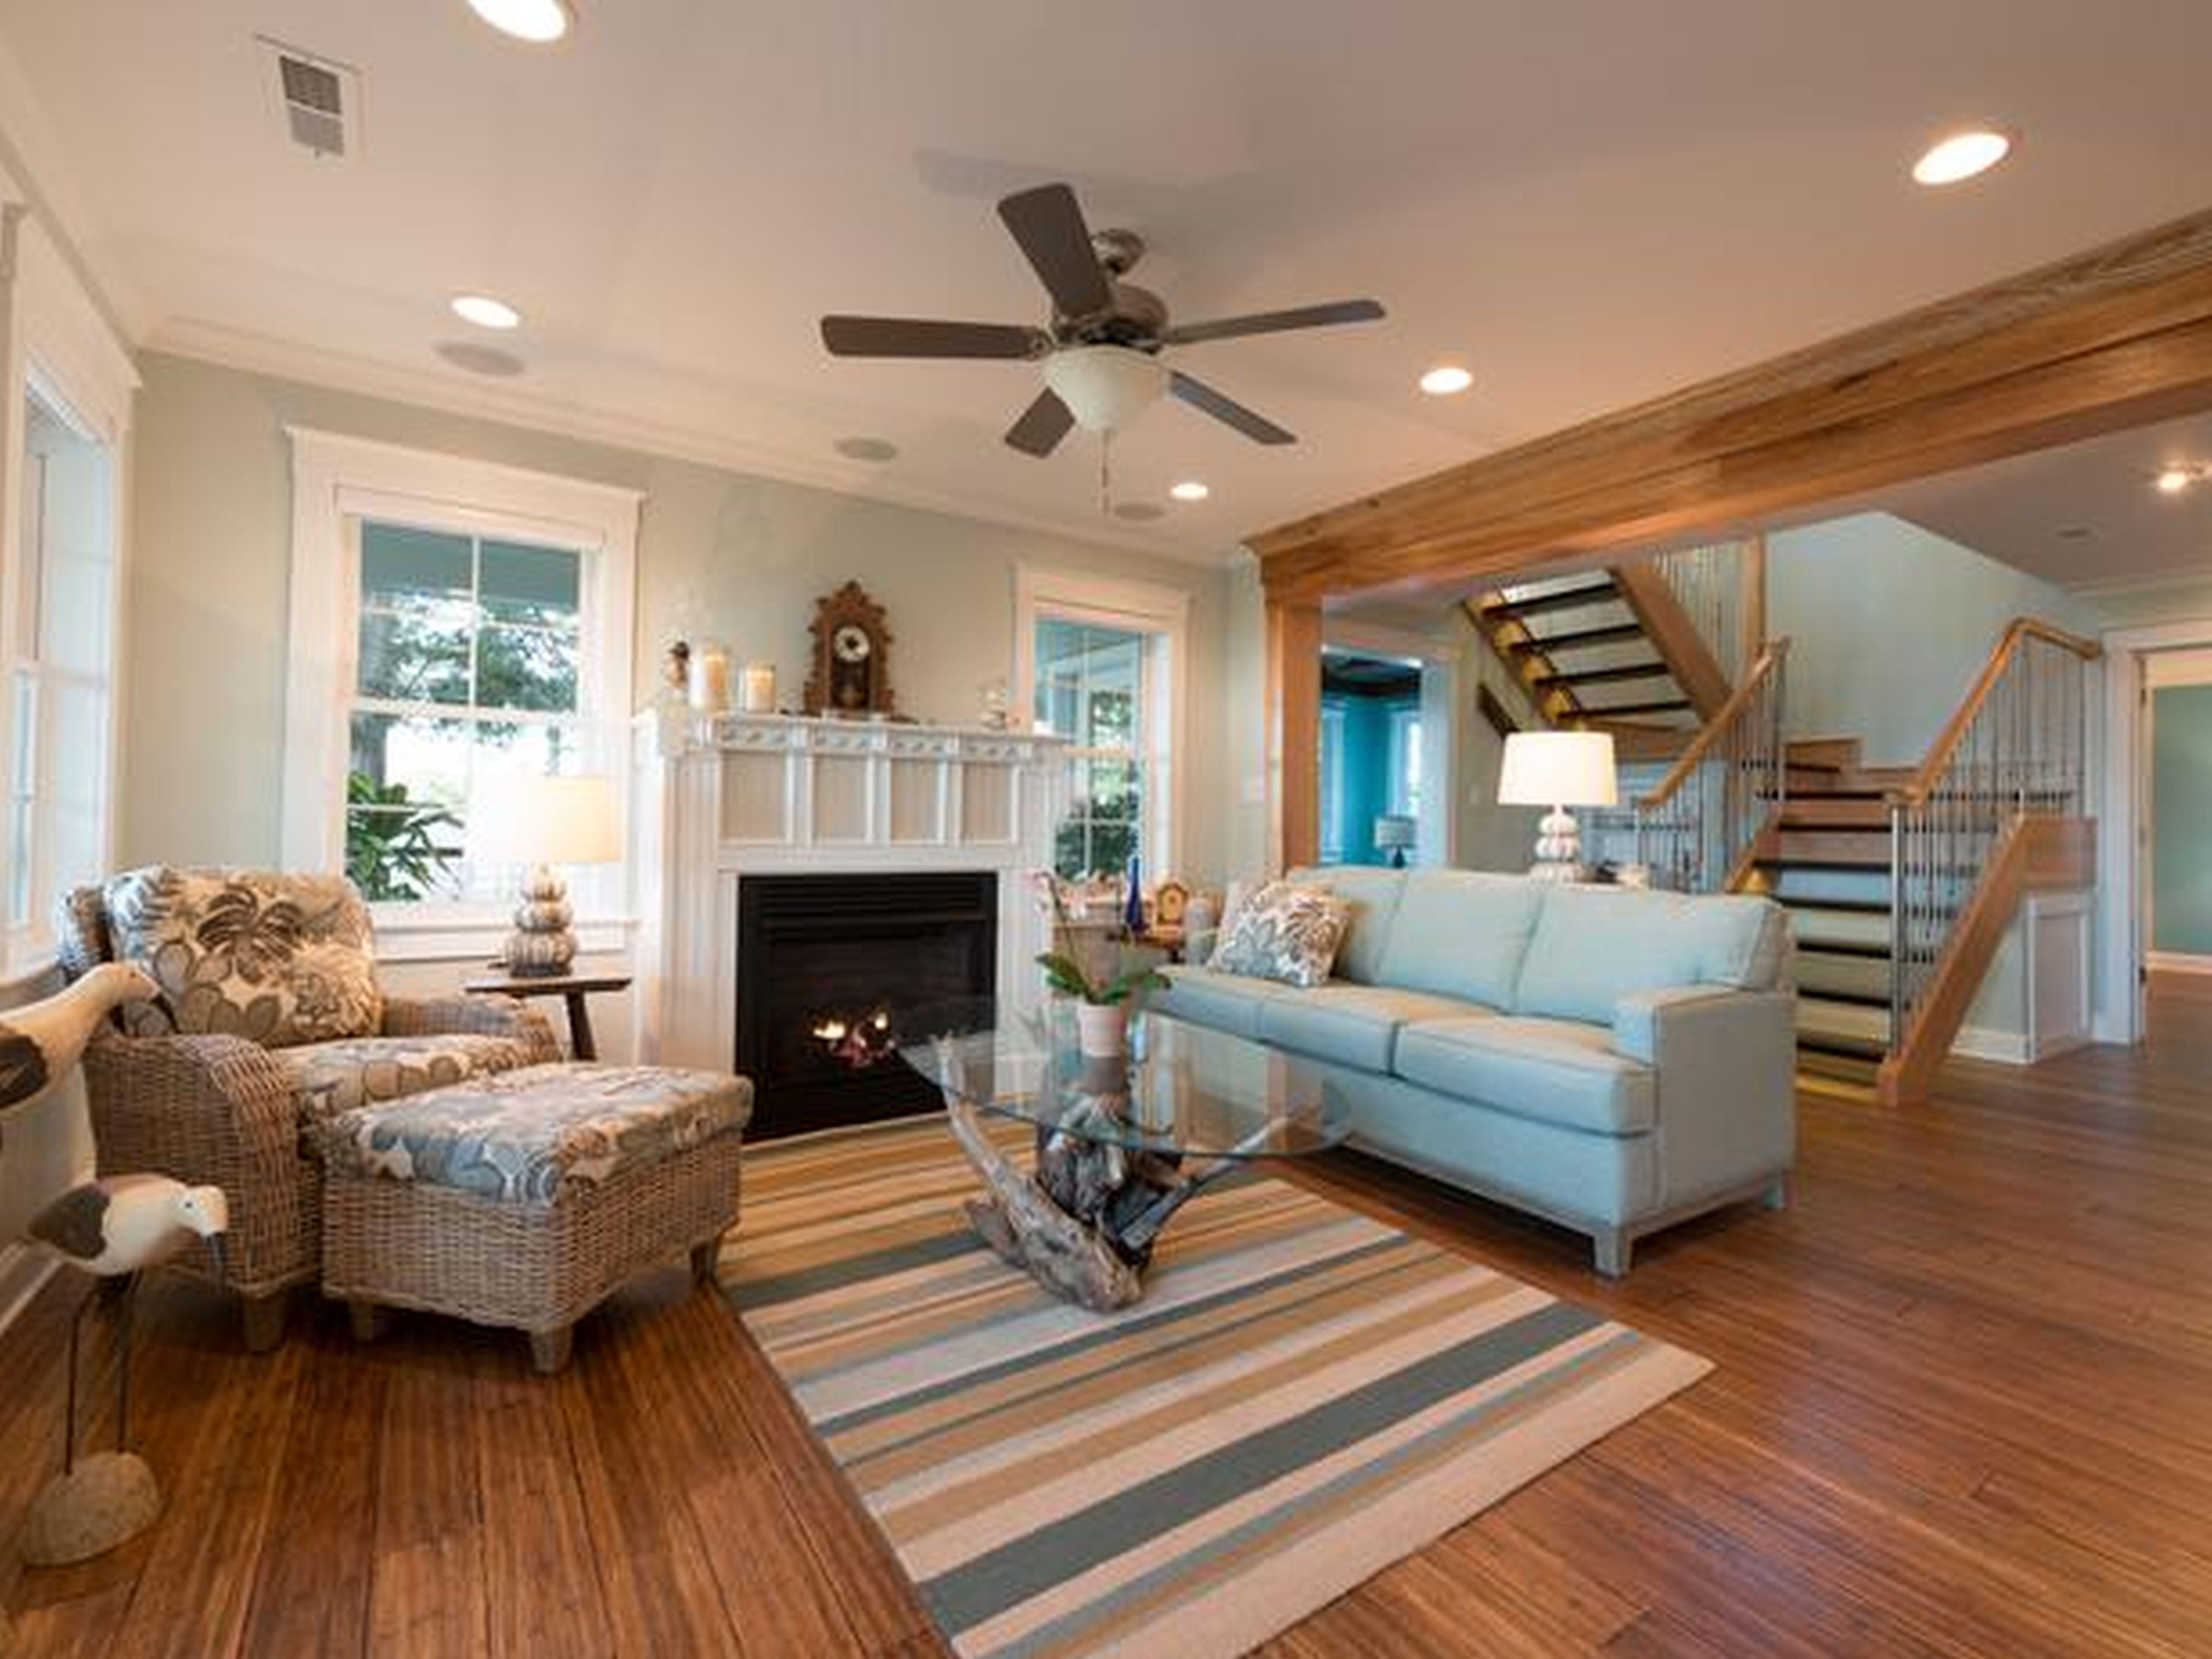 Interior interior ideas wonderful great room design ideas for